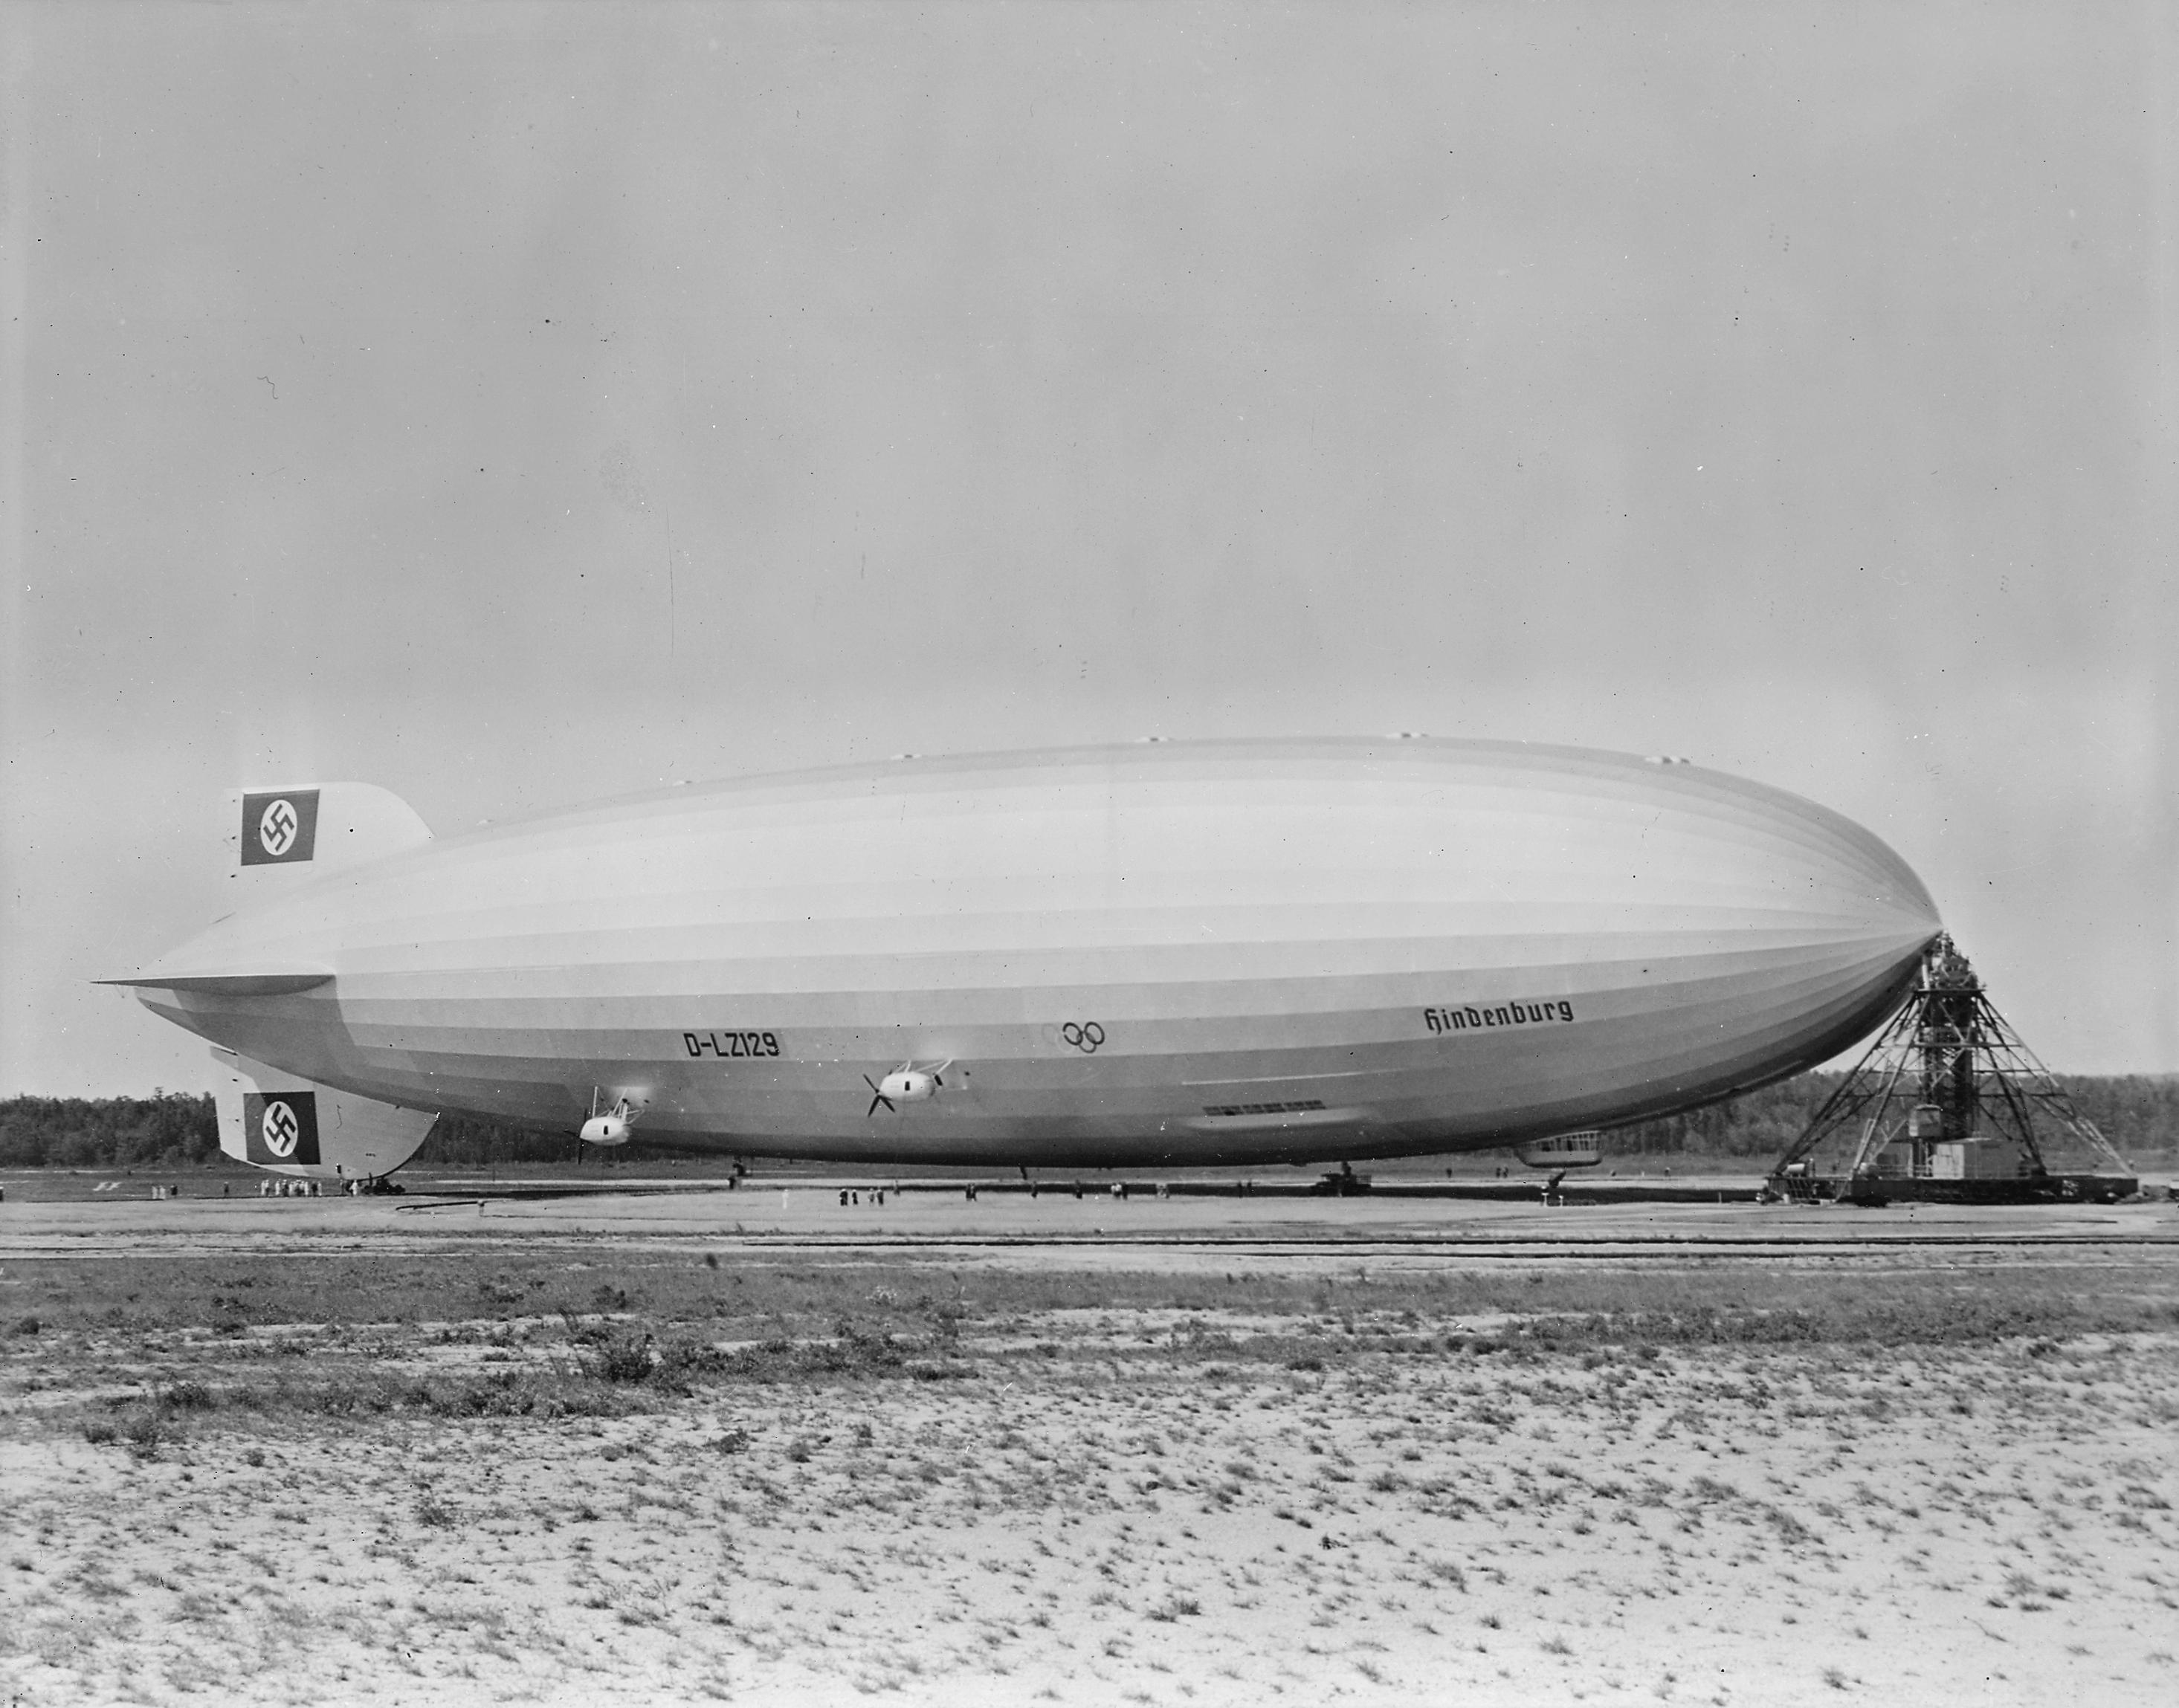 Hindenburg_at_lakehurst